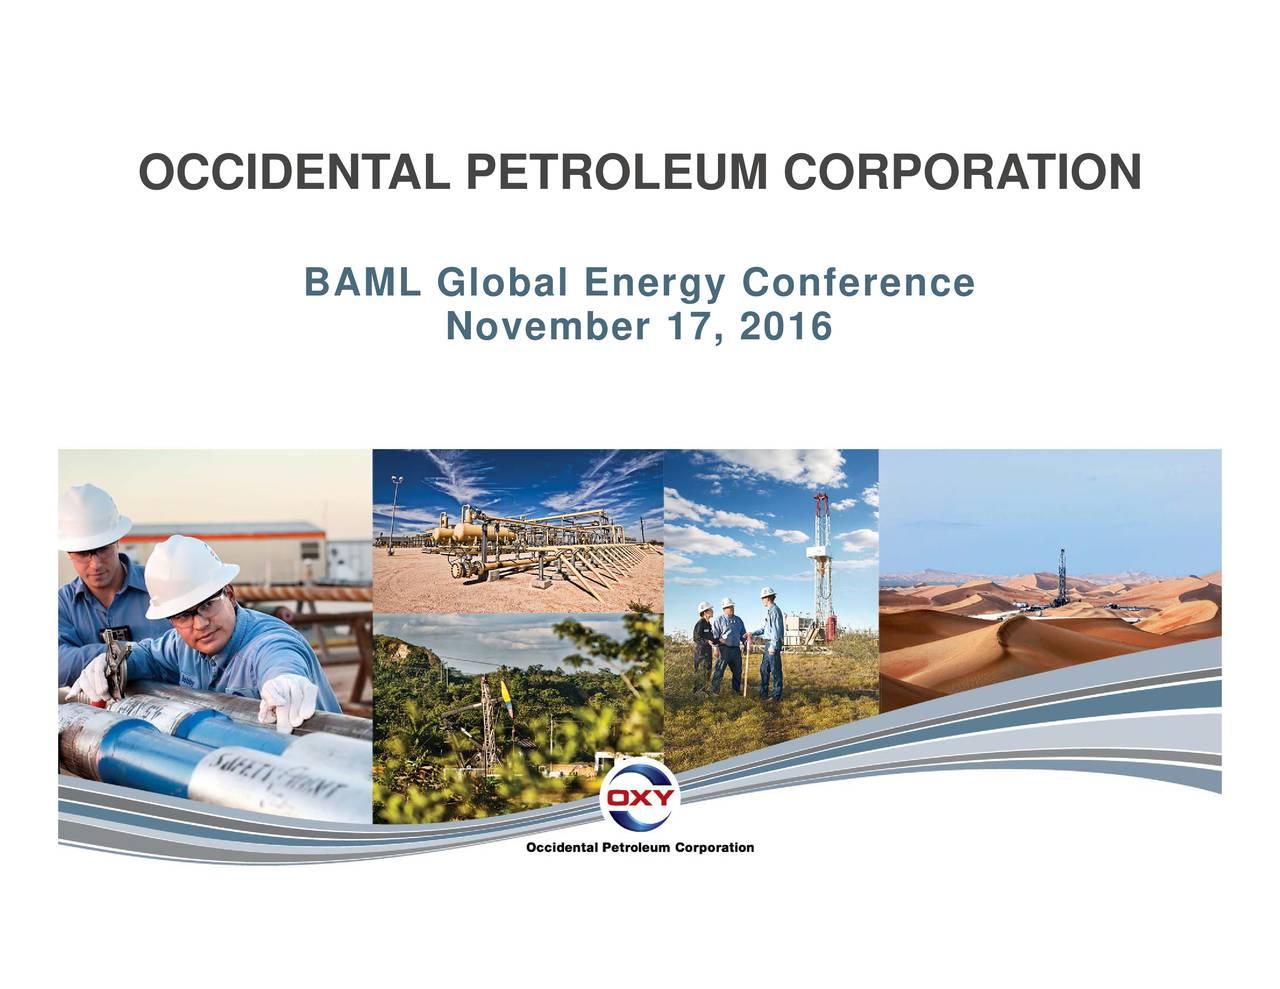 BAML Global Energy Conference OCCIDENTAL PETROLEUM CORPORATION